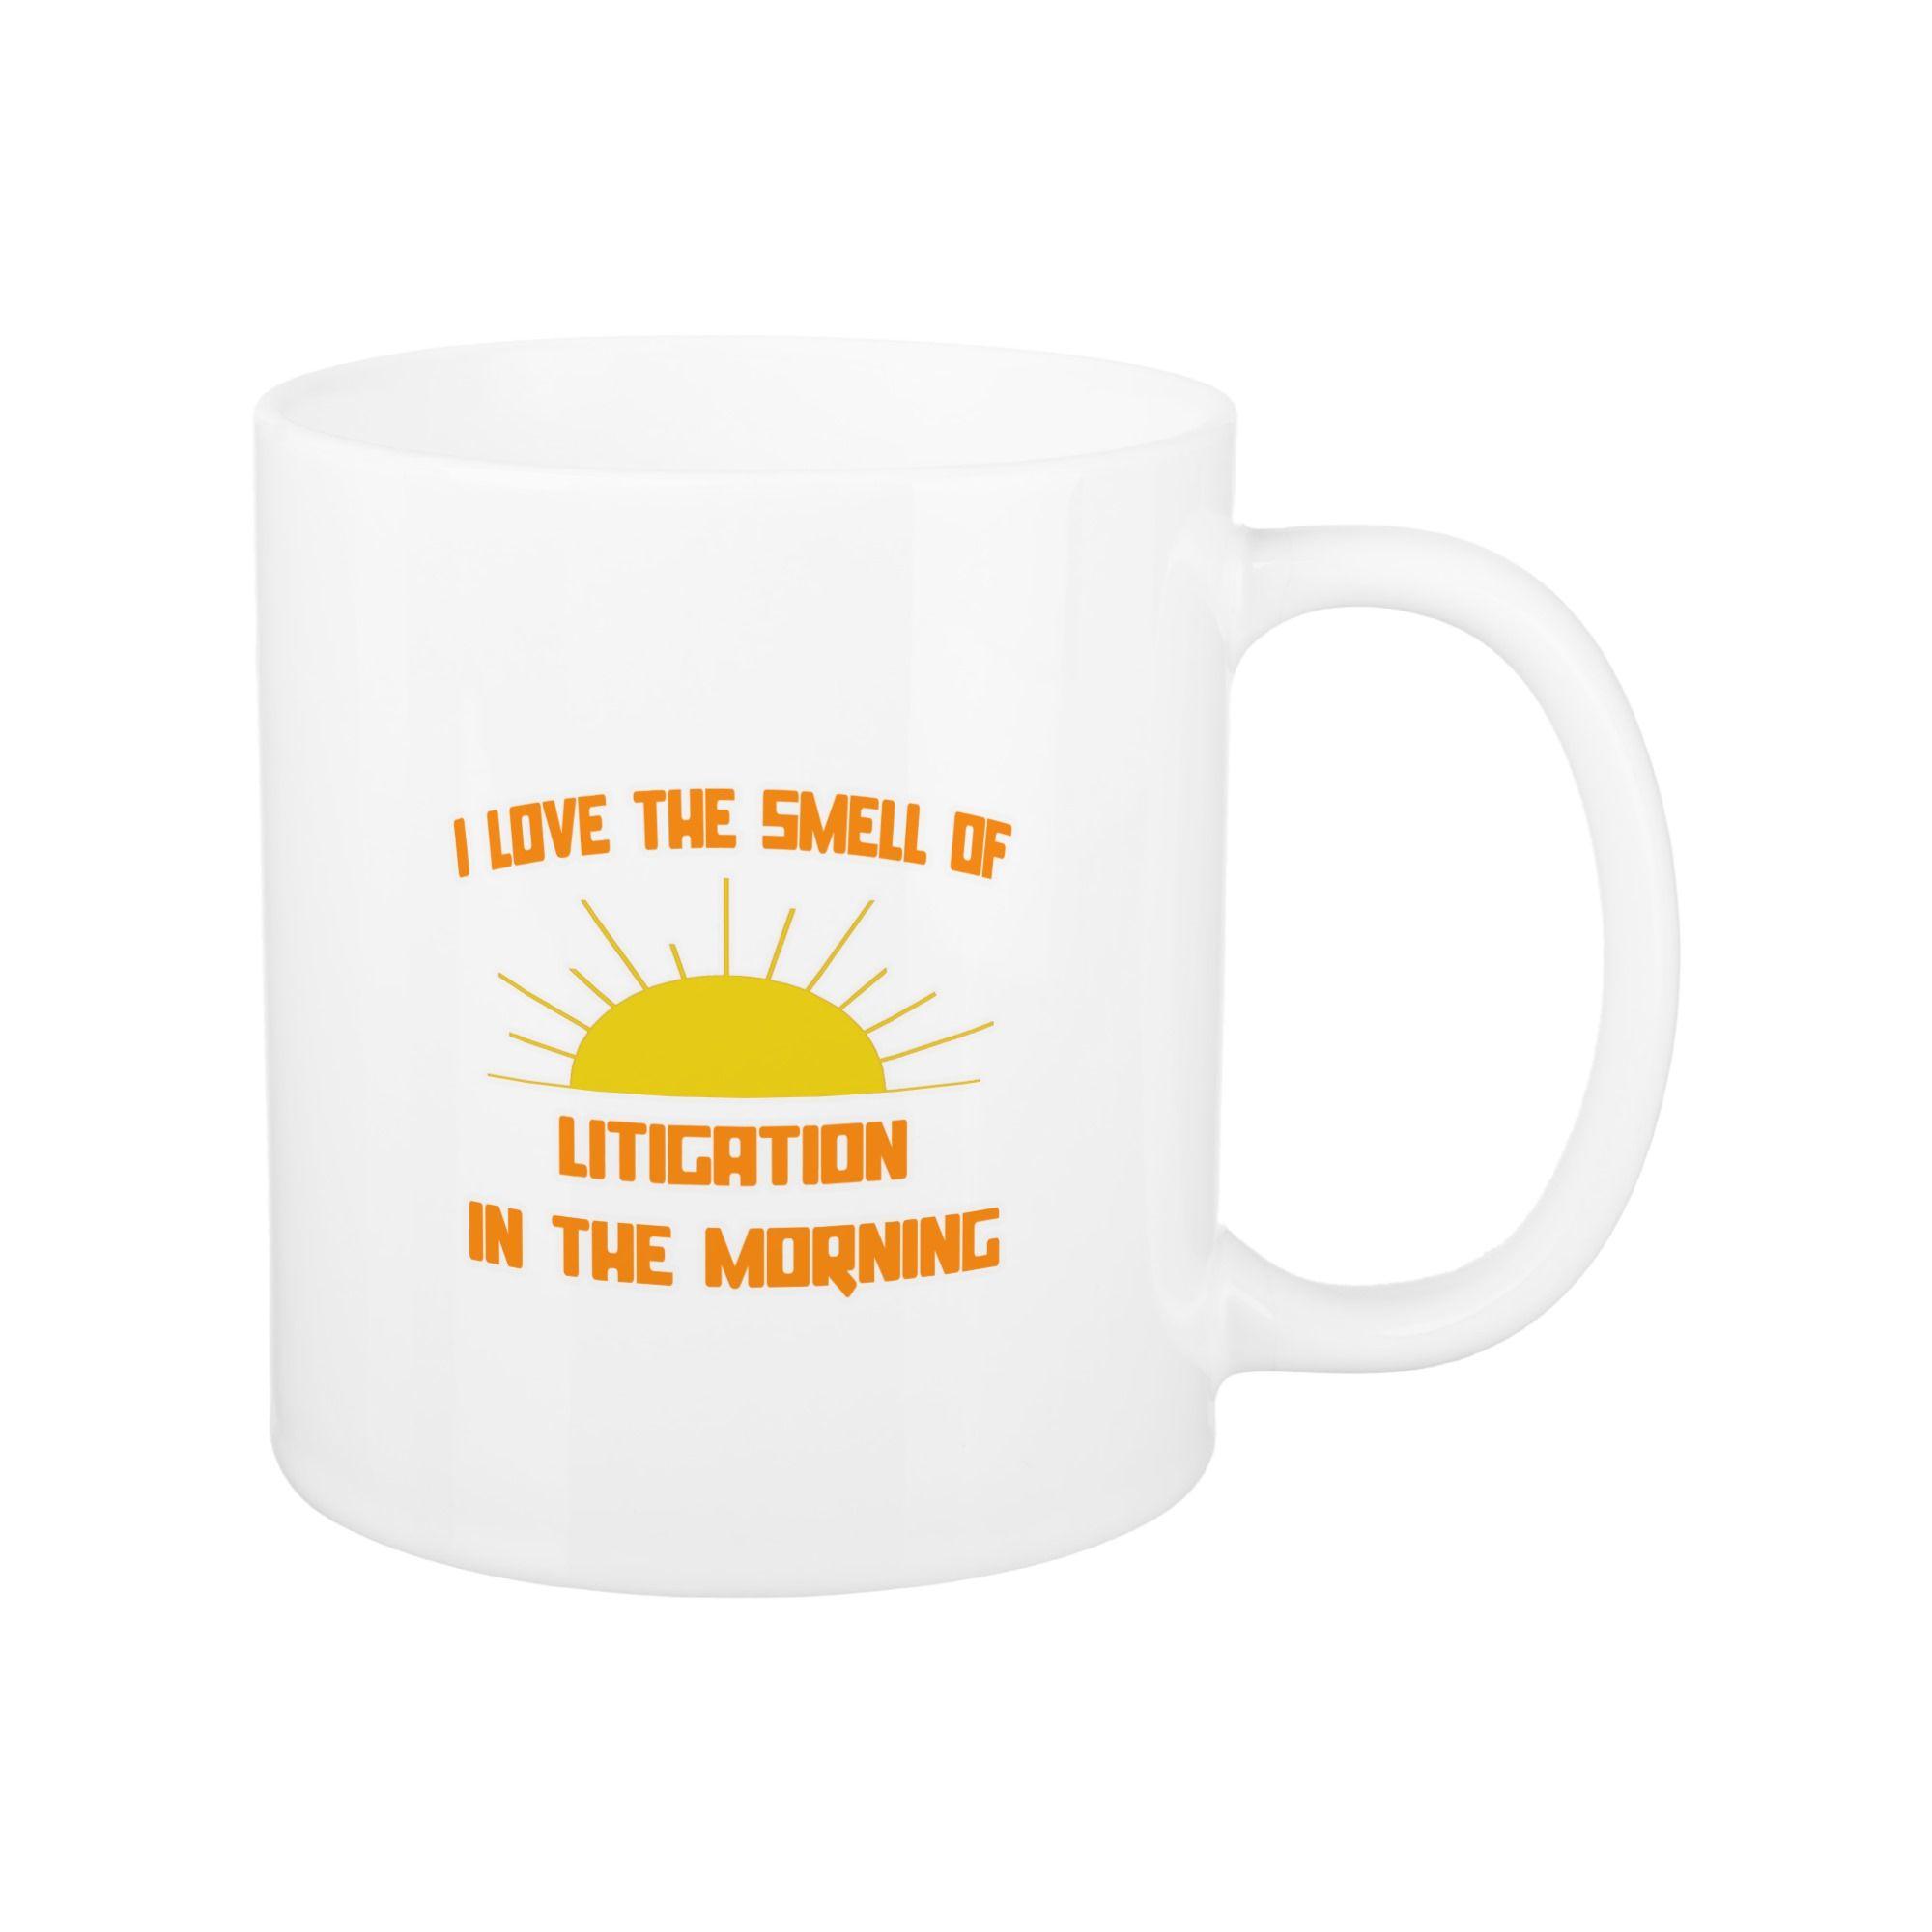 Litigation mug